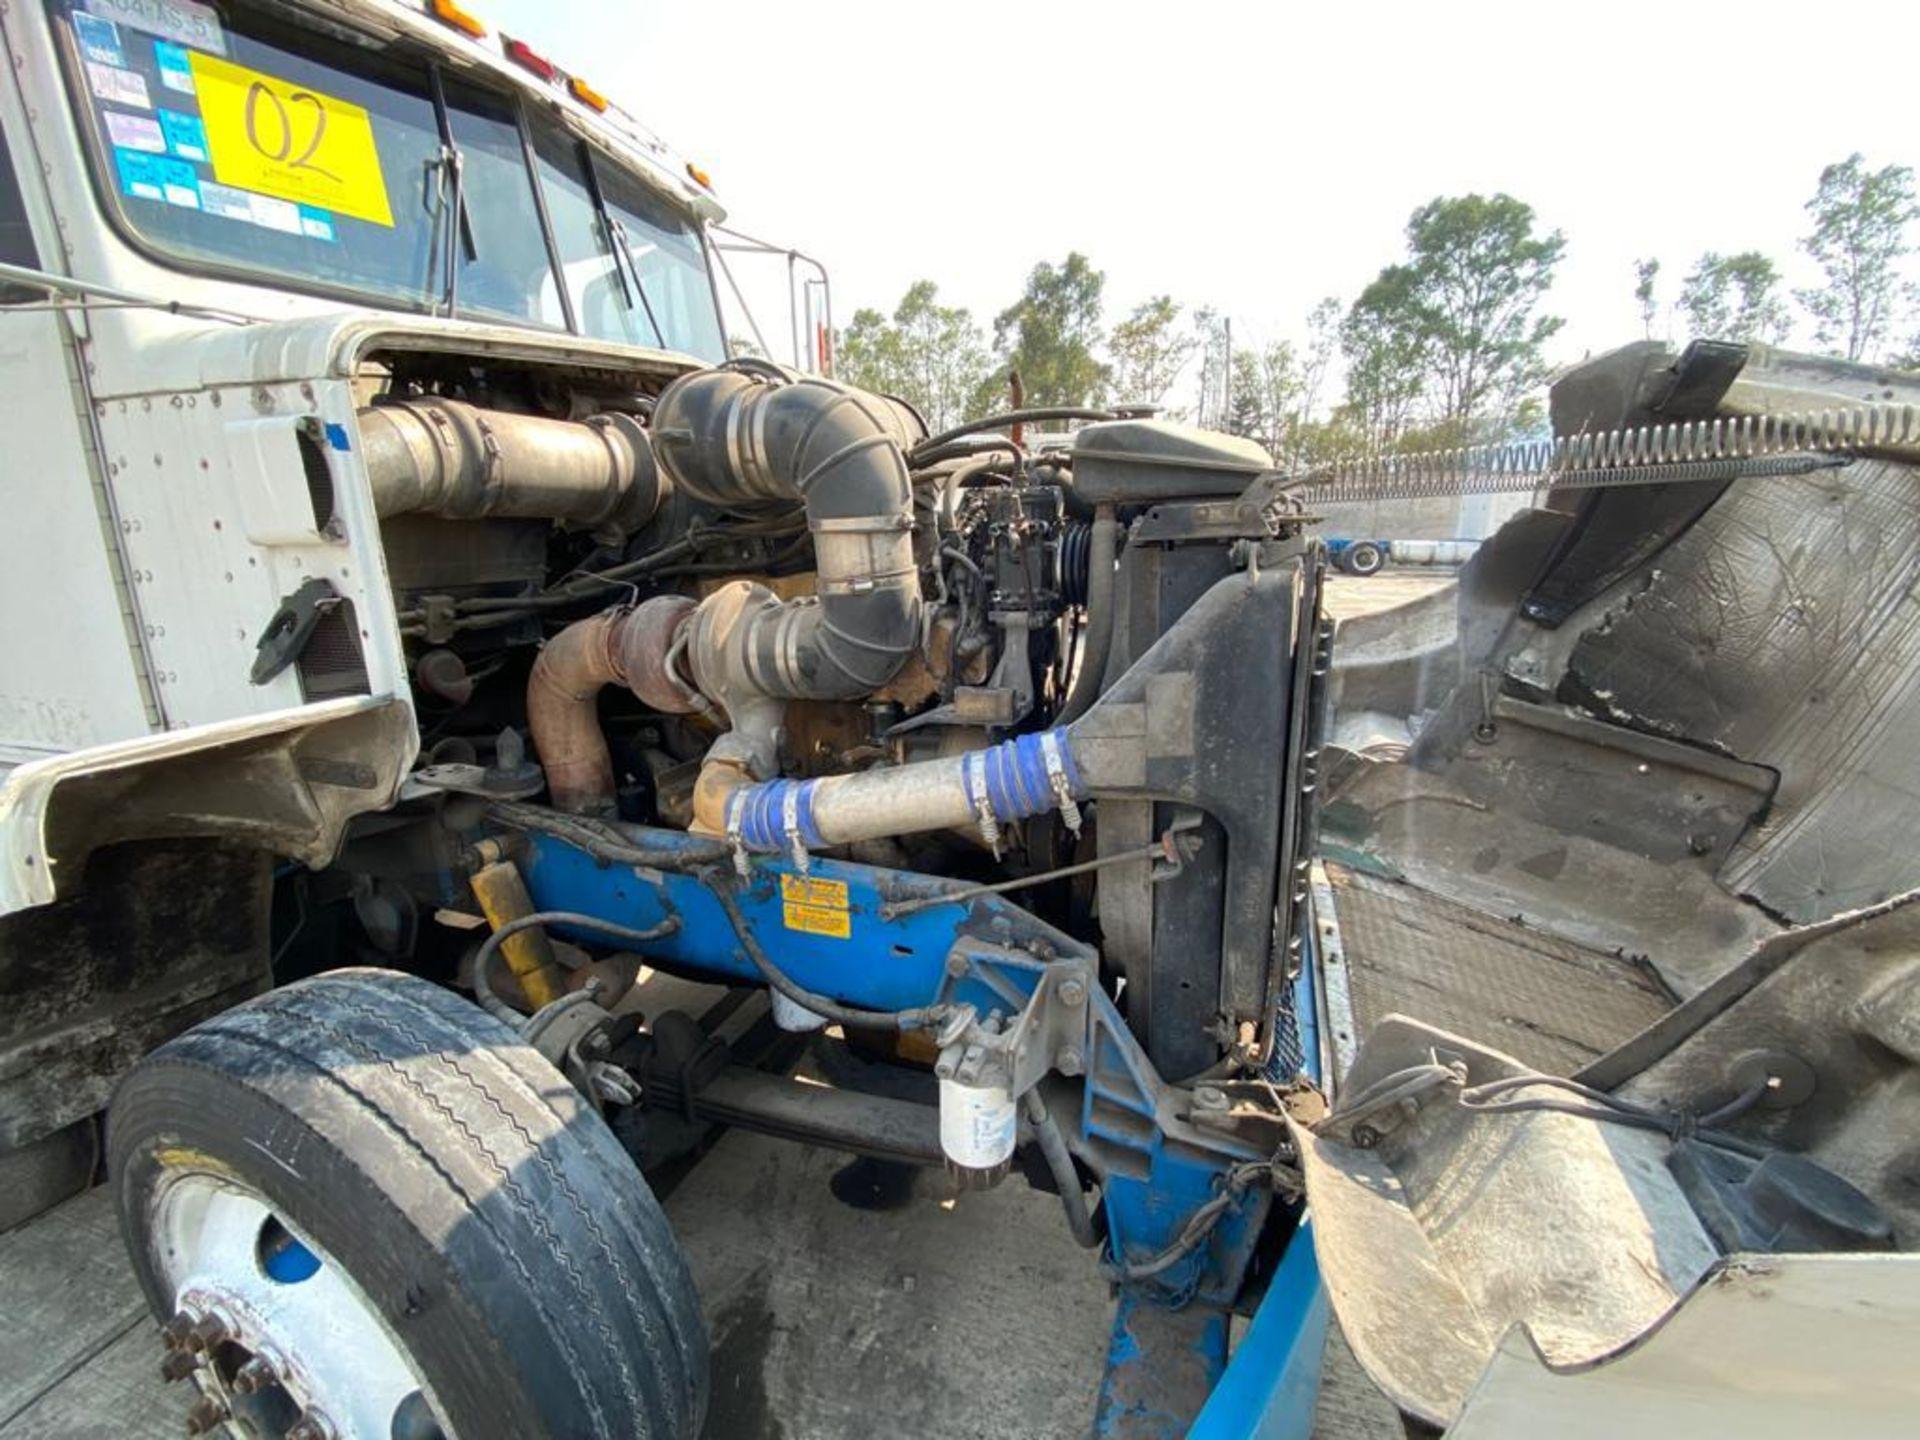 1999 Kenworth Sleeper truck tractor, standard transmission of 18 speeds - Image 70 of 75